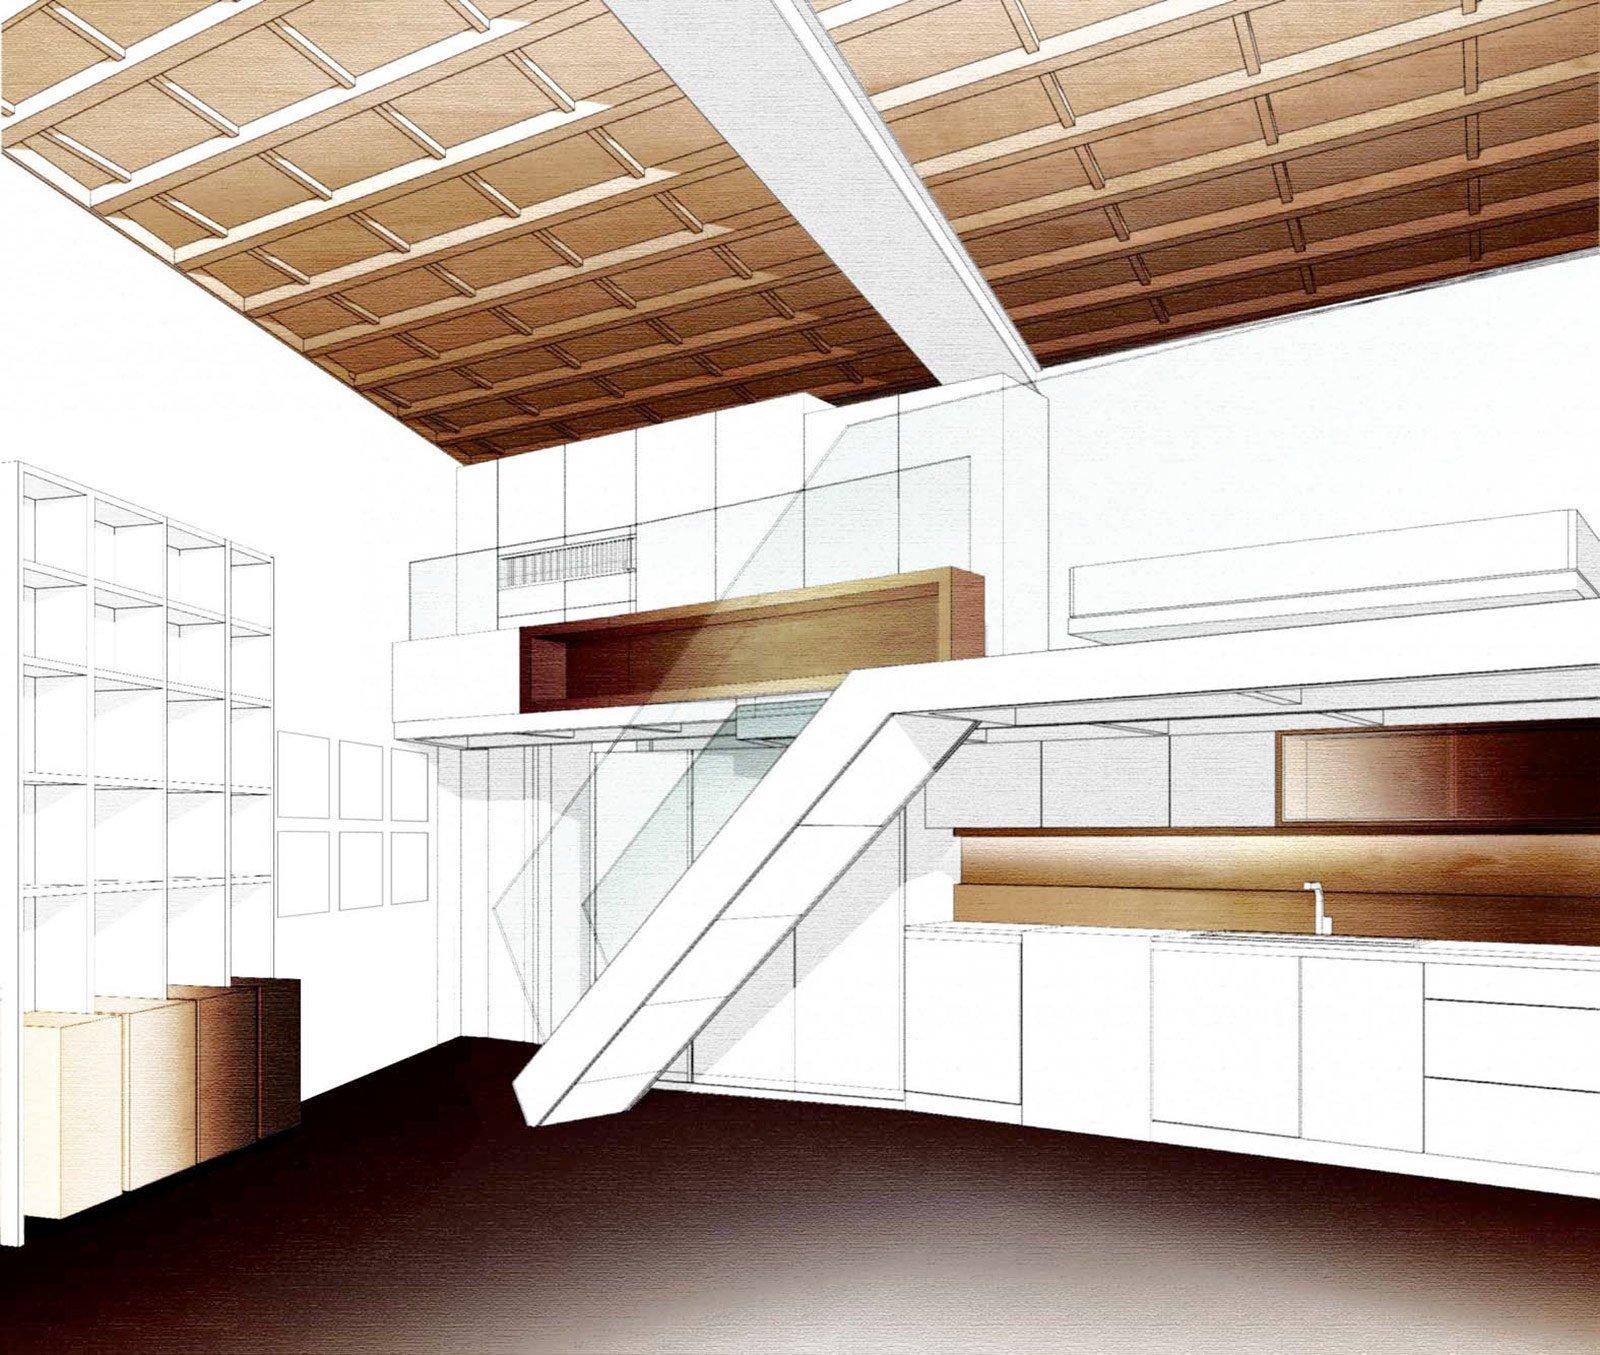 Disegno struttura cucina piacentini cose di casa for Disegno cucina